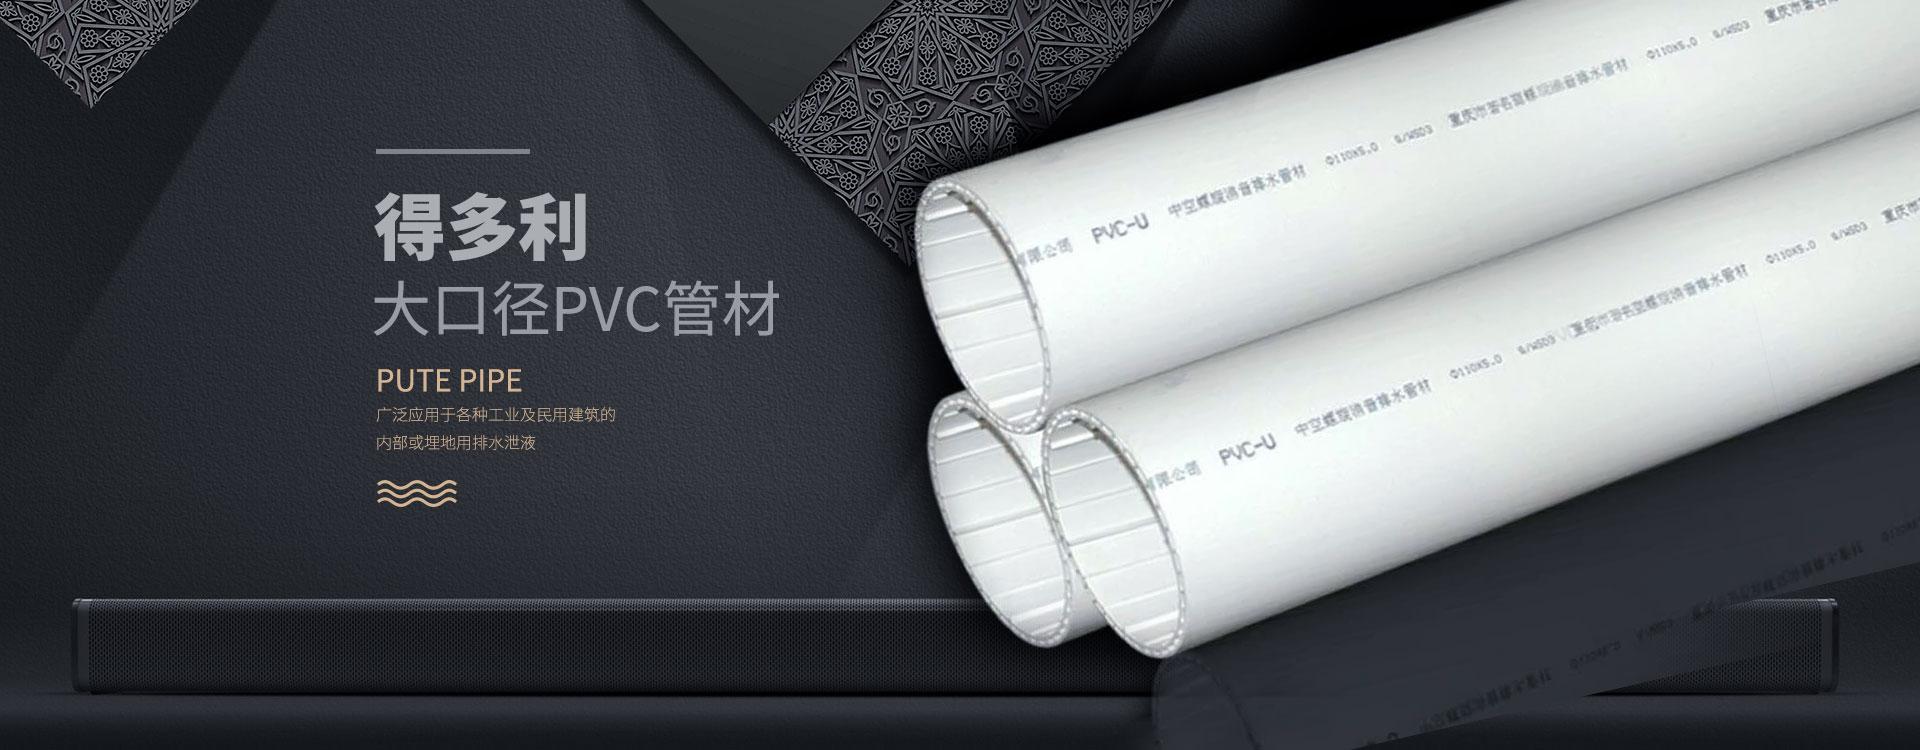 PVC給水管安裝方法